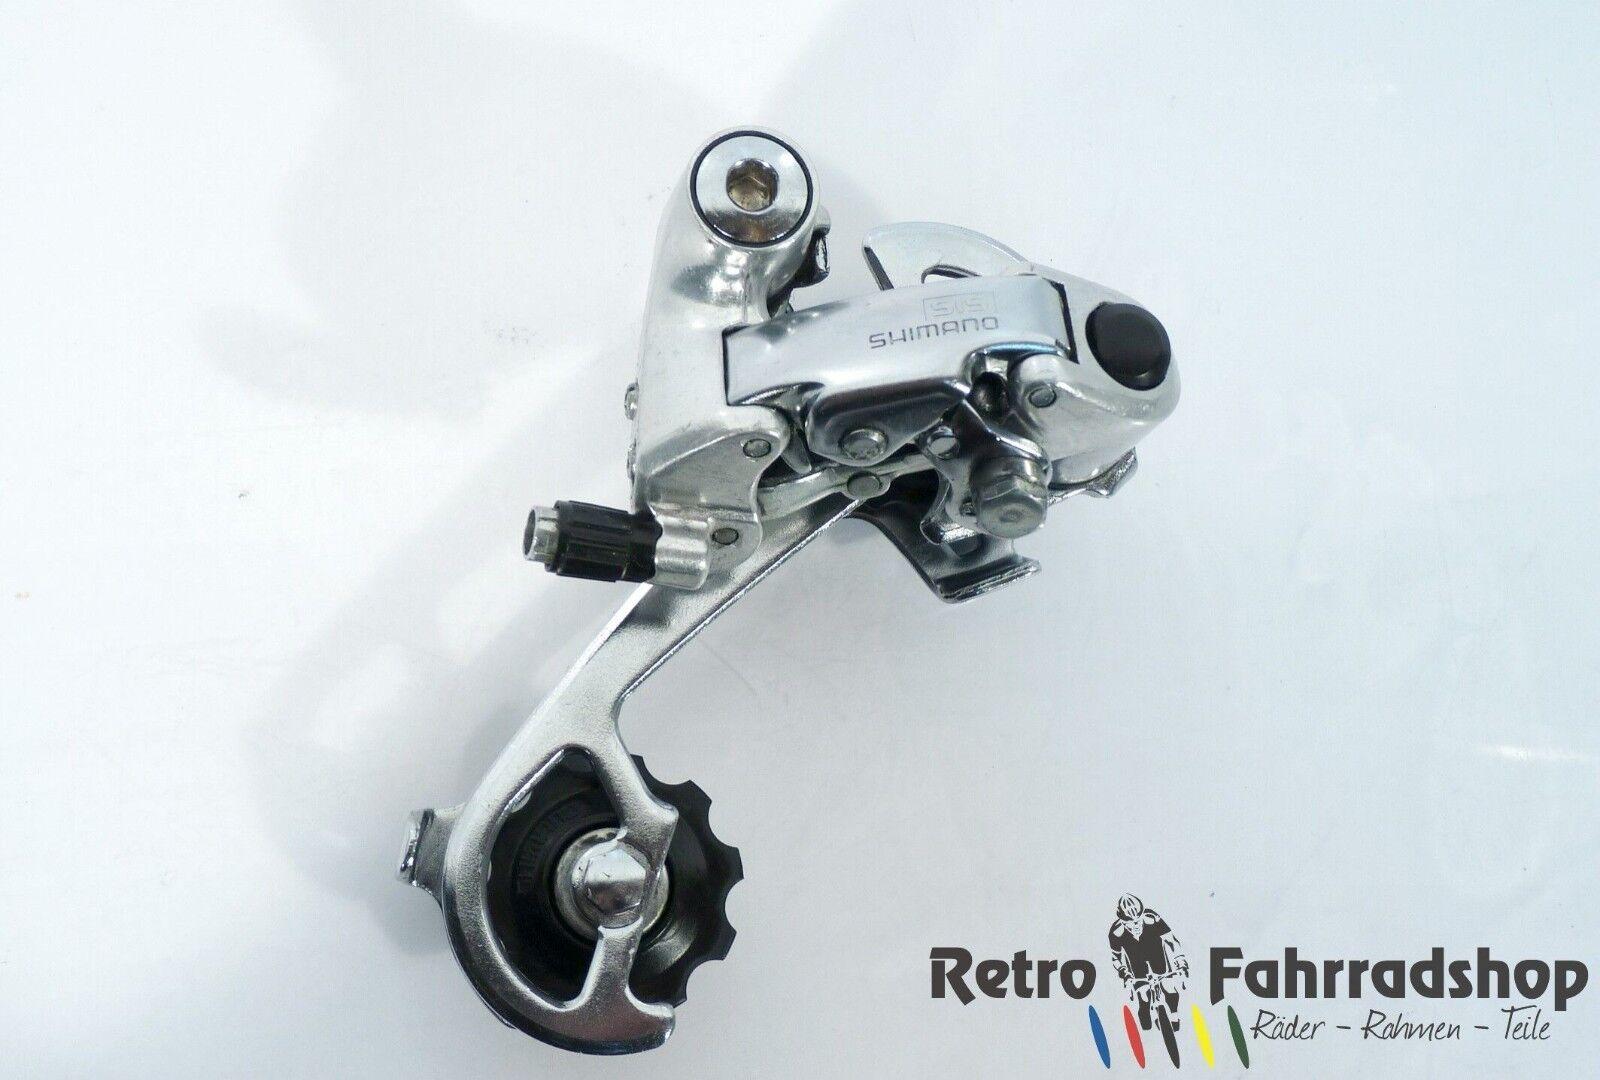 Shimano SIS rd-m531 MTB Derailleur BJ 1987 Retro 3x6 Box 302g Rare Excellent Condition